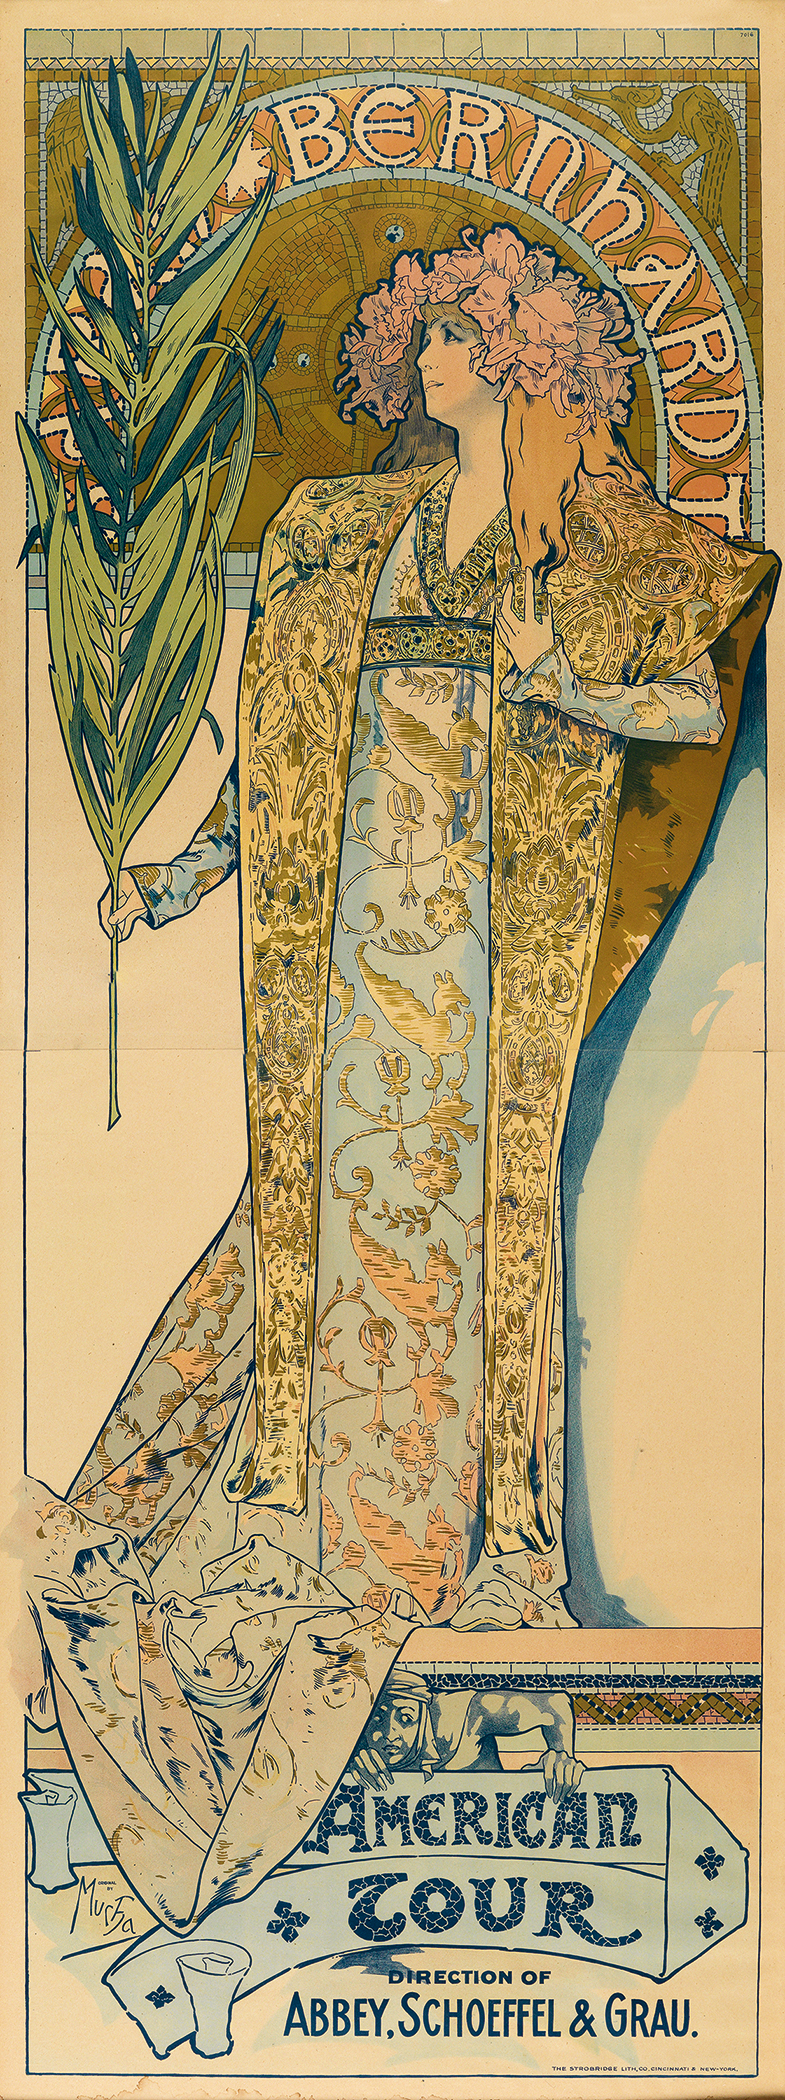 A poster that advertises Sarah Bernhardt's 1896 American Tour. Alphonse Mucha designed it.